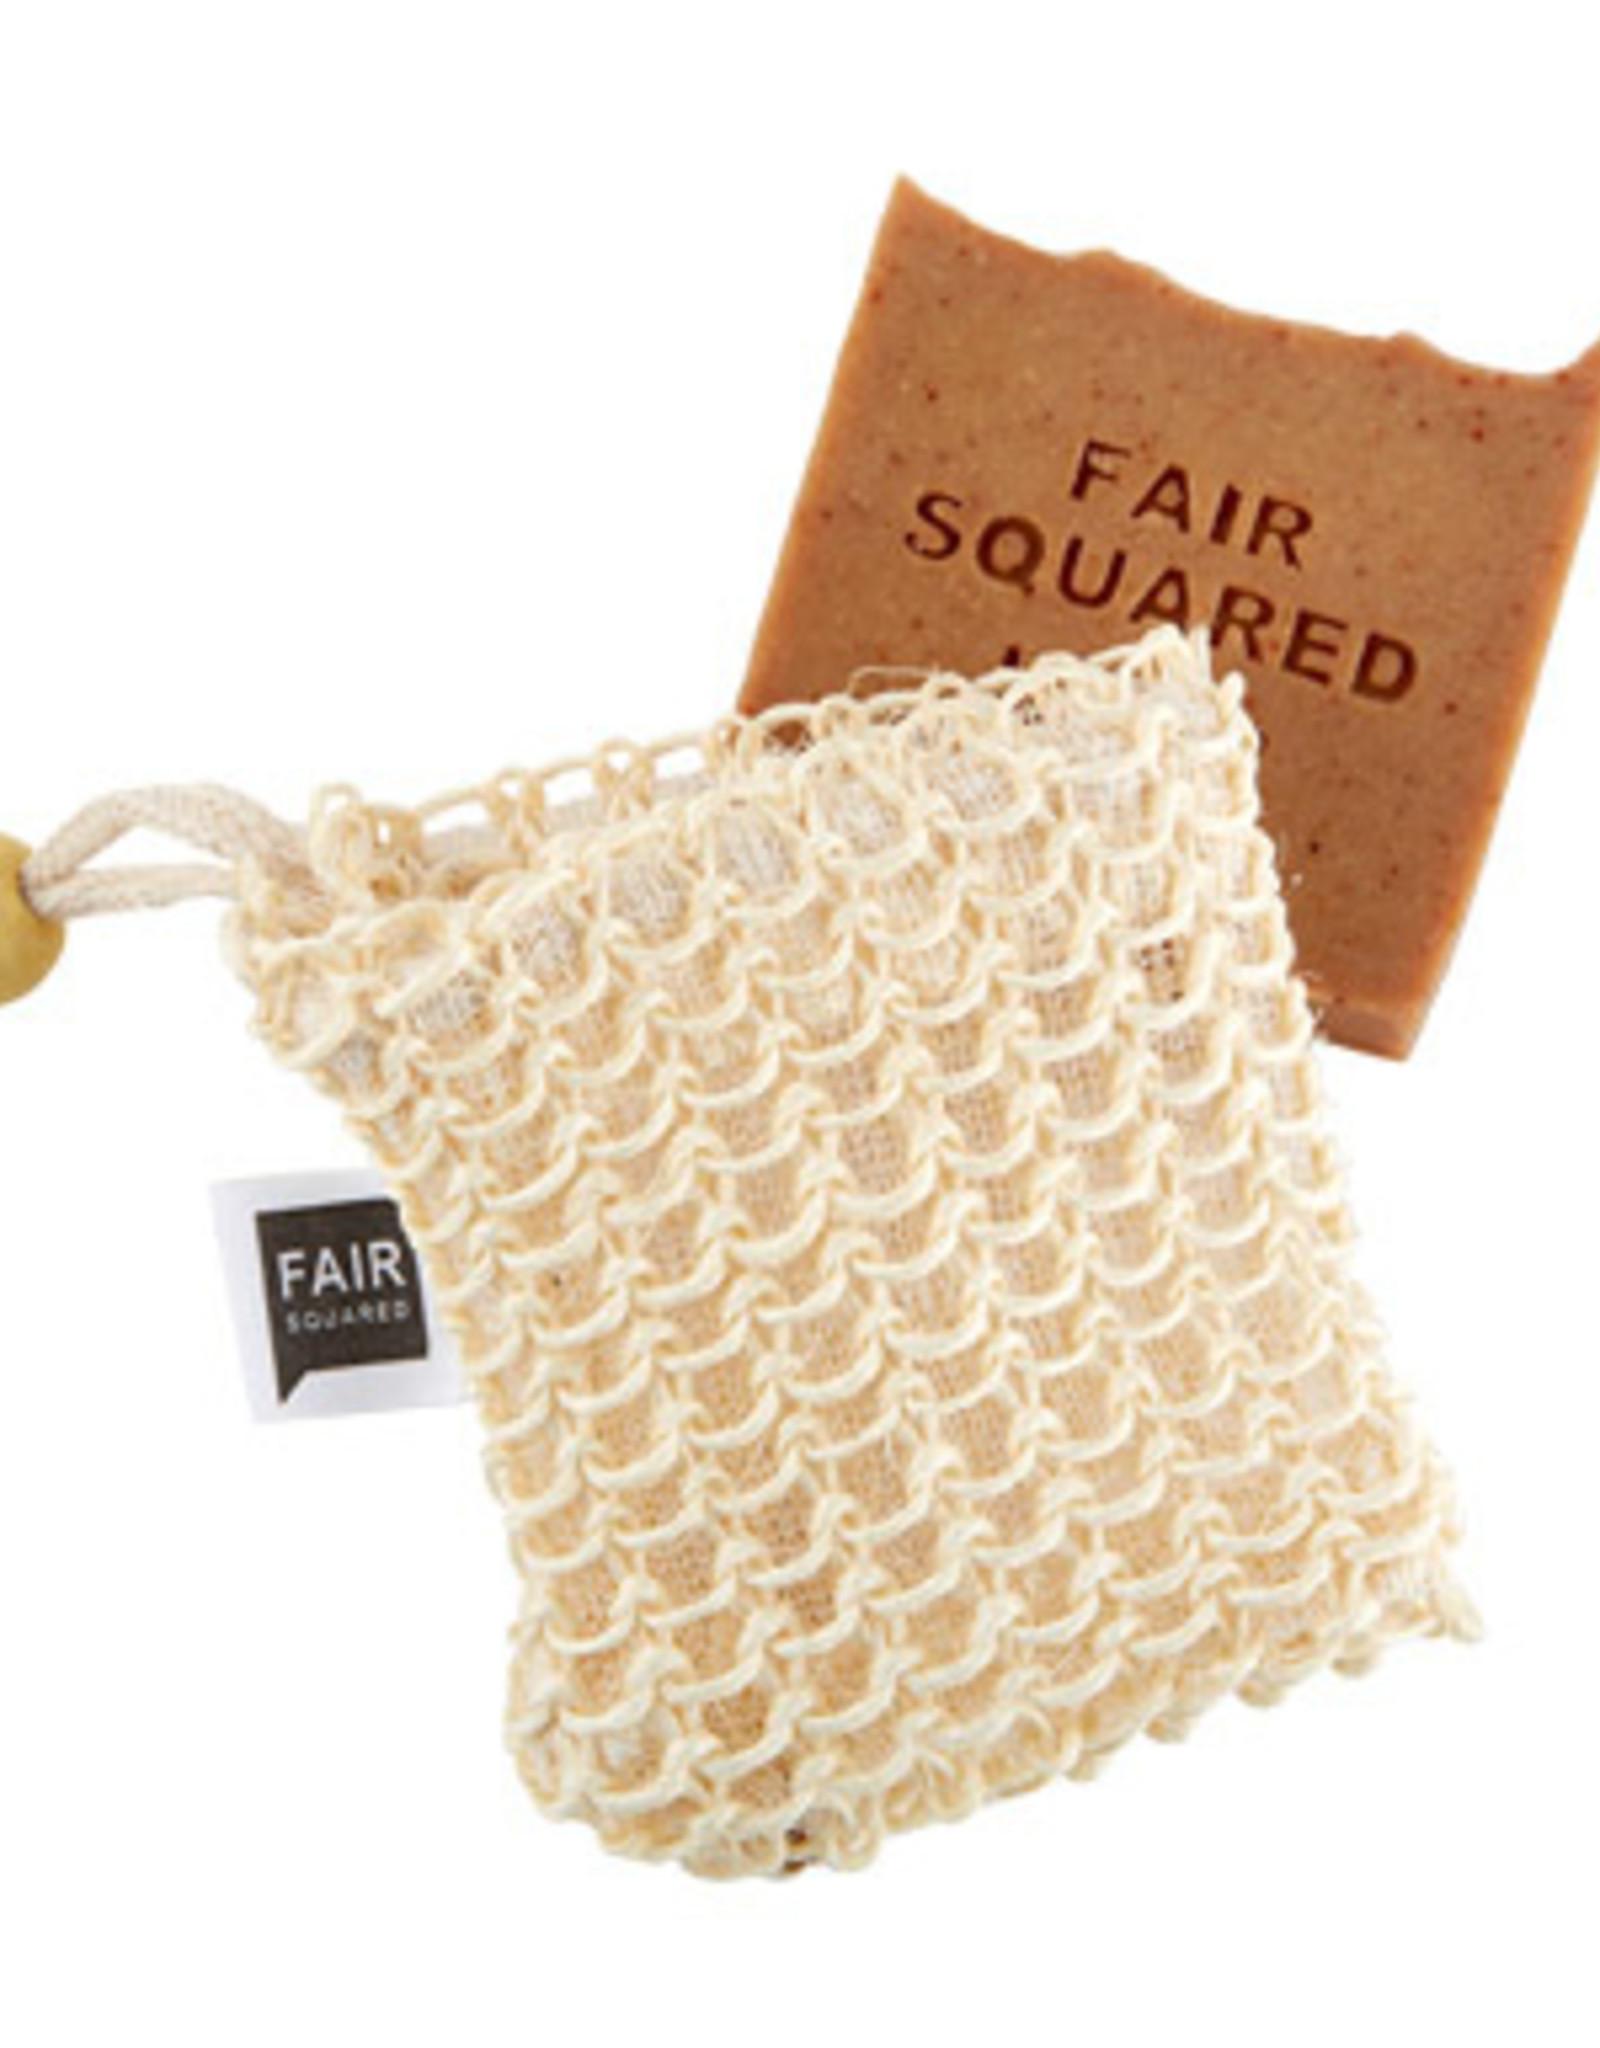 Fairsquared Soap pouch  fairsquared